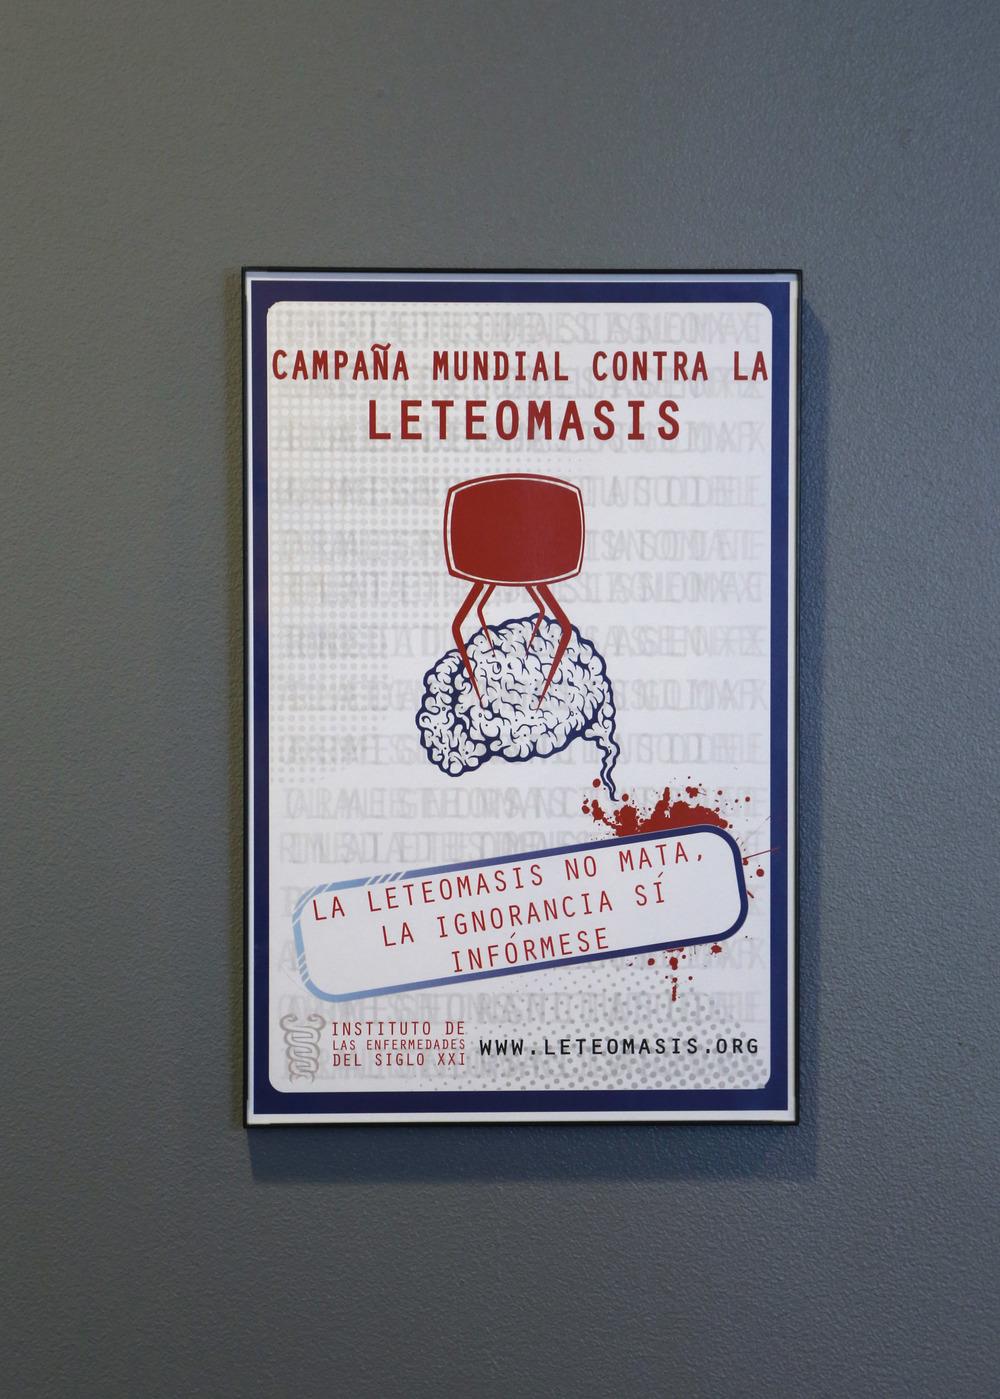 leteomasis-poster-small.jpg